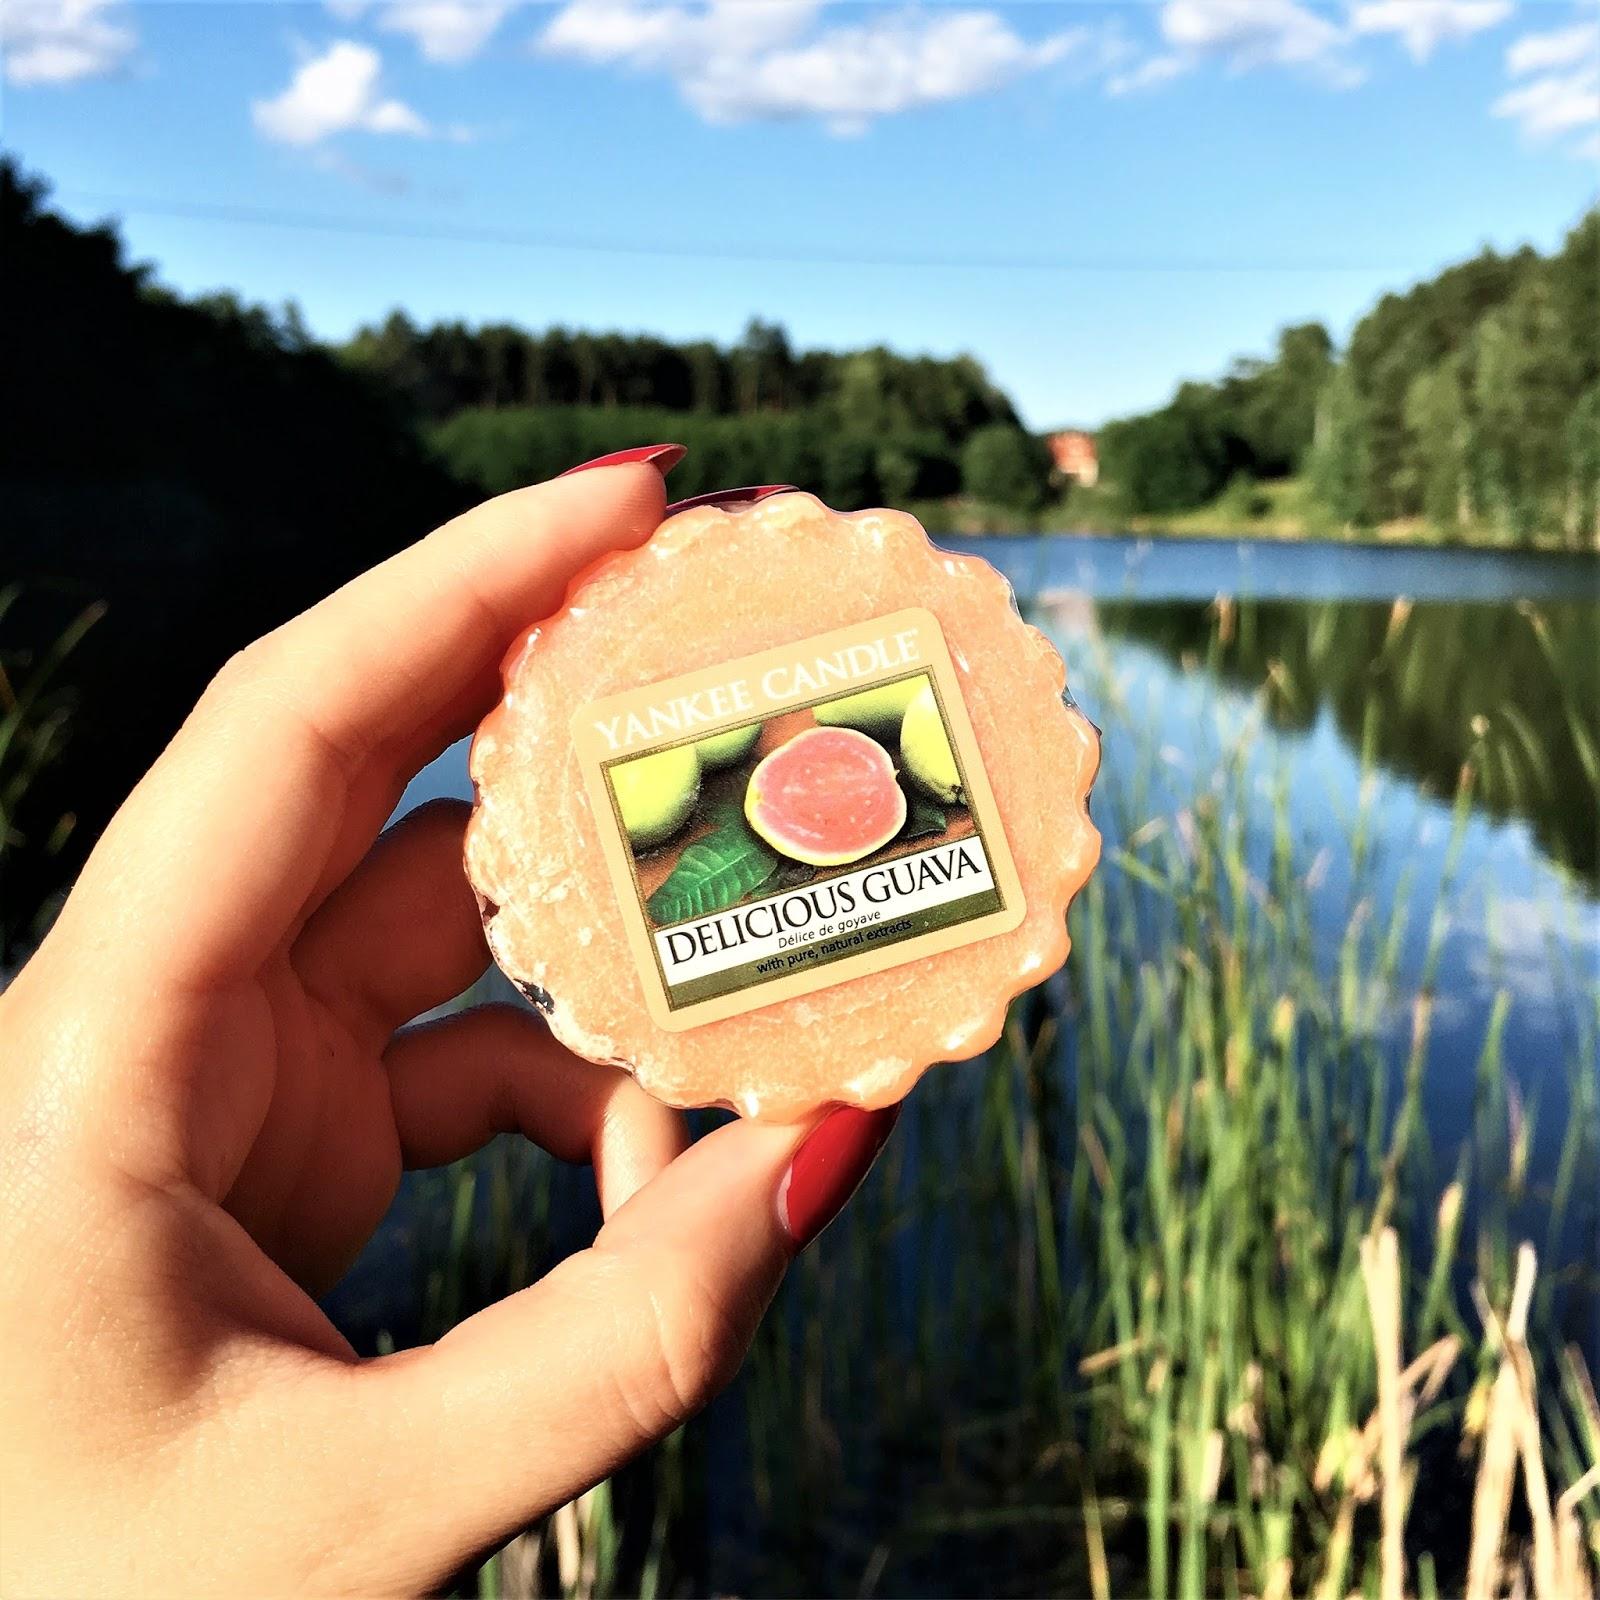 Owocowa rozkosz - Delicious Guava